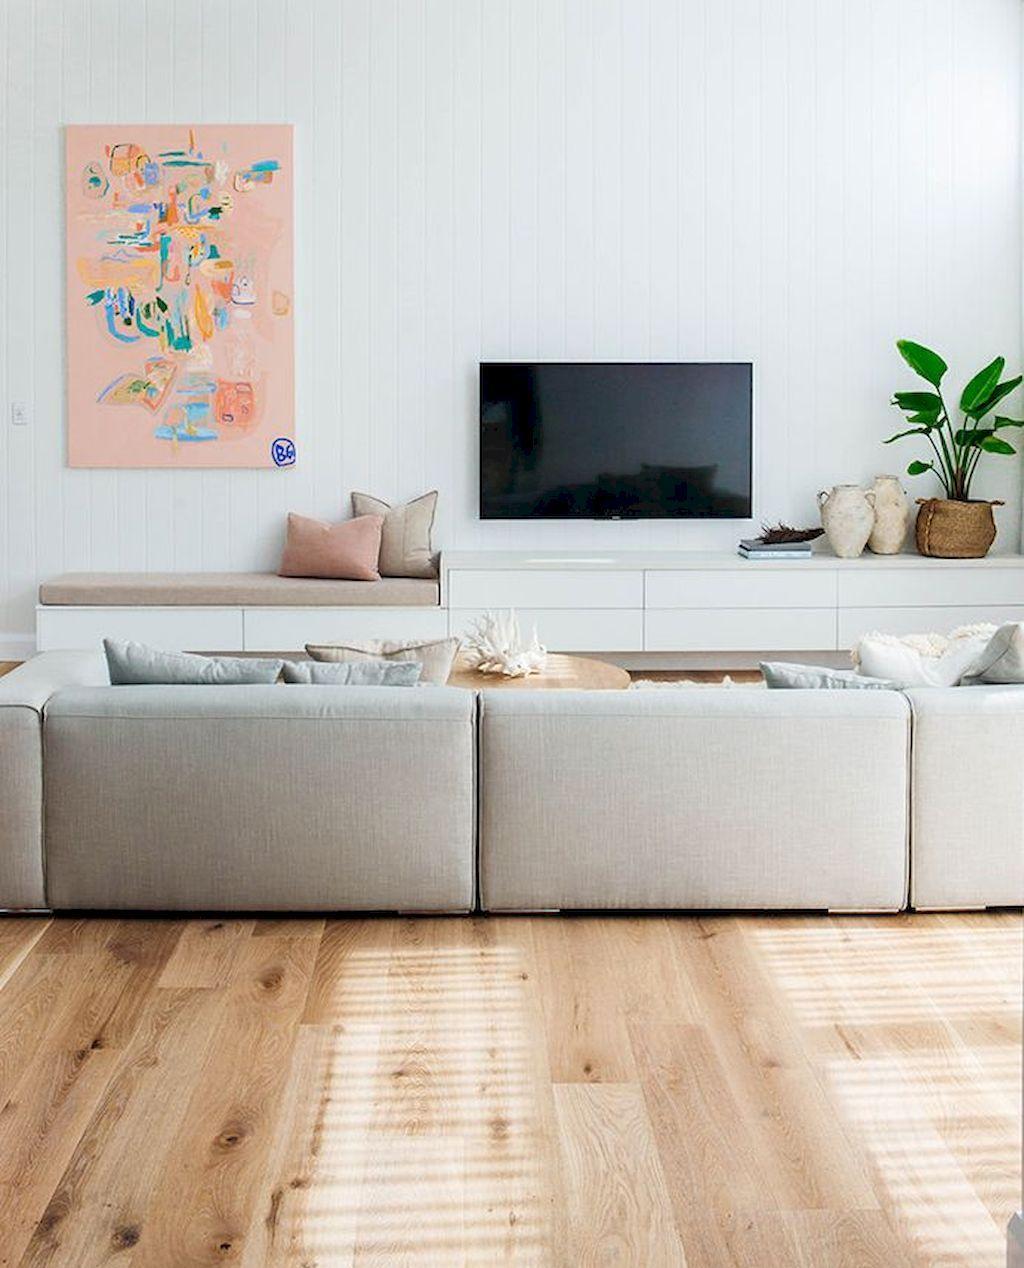 Top Ideas Of Bright Tone Wooden Floor For Maximum Interior Look Part 29 Shairoom Com Wood Floor Design Light Wood Floors Modern Furniture Living Room